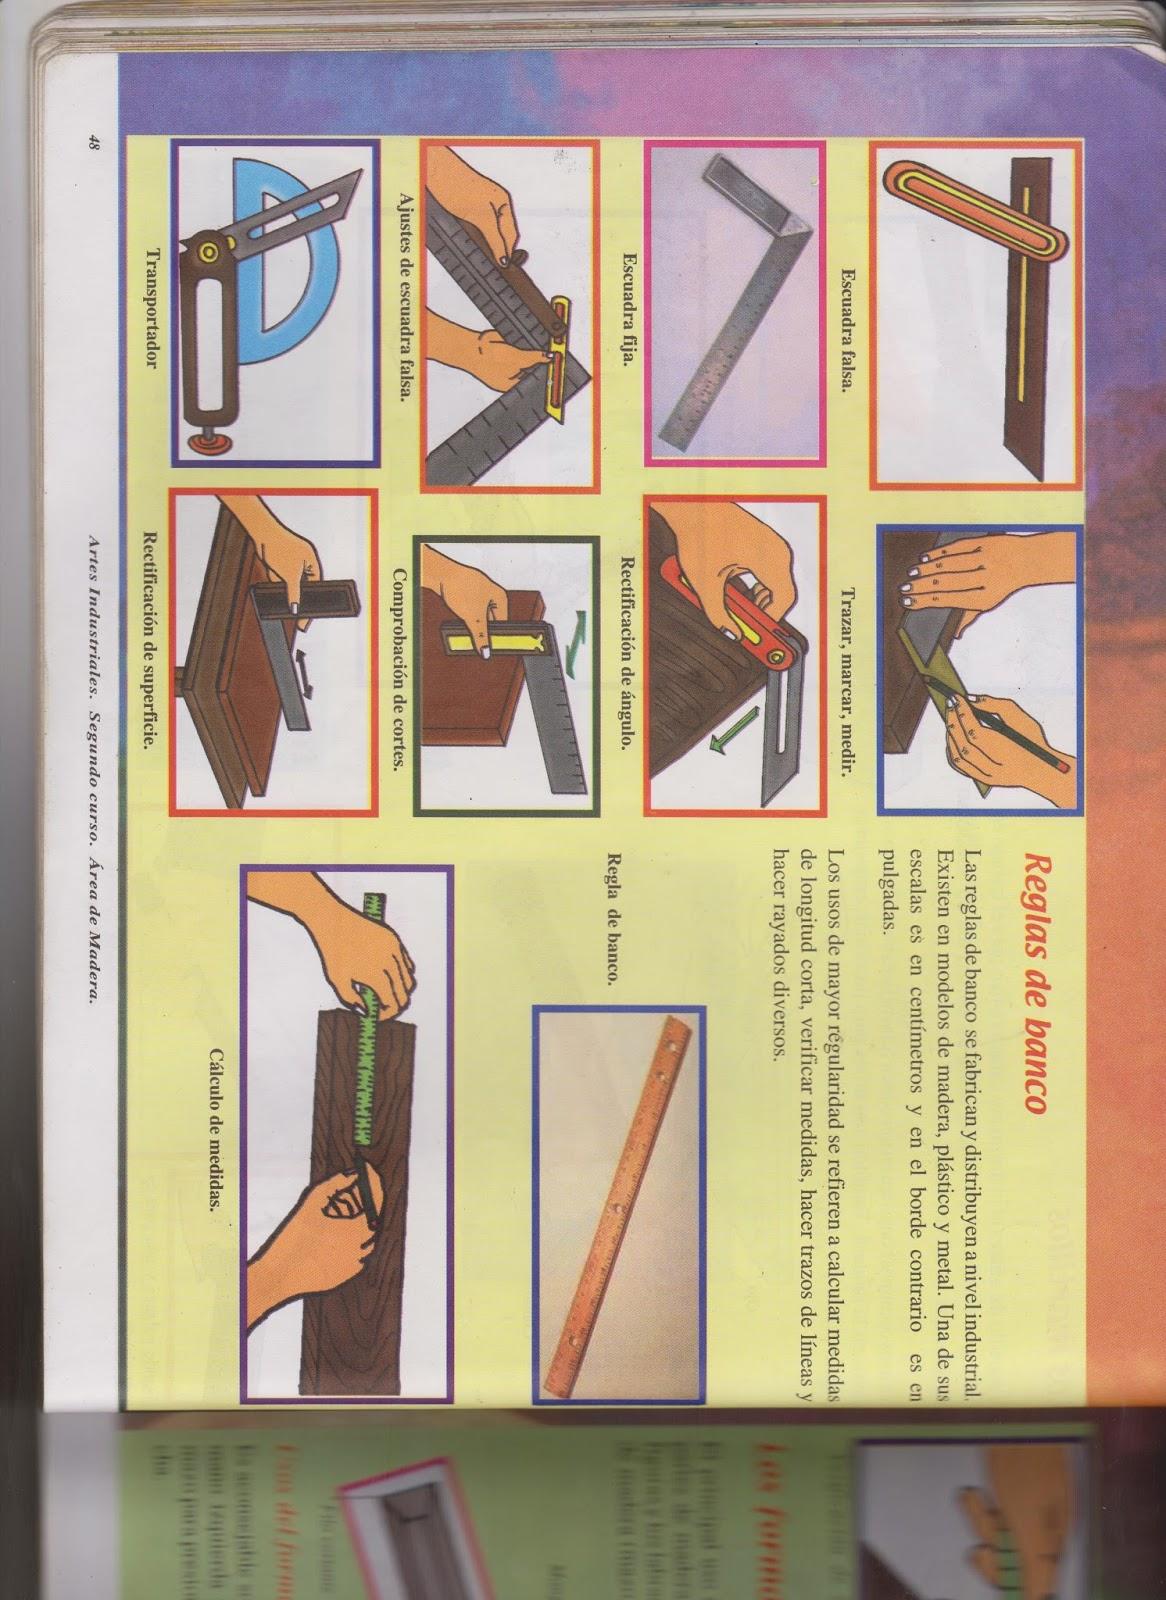 Herramientas de carpinteria segundo basico - Herramientas de carpinteria nombres ...